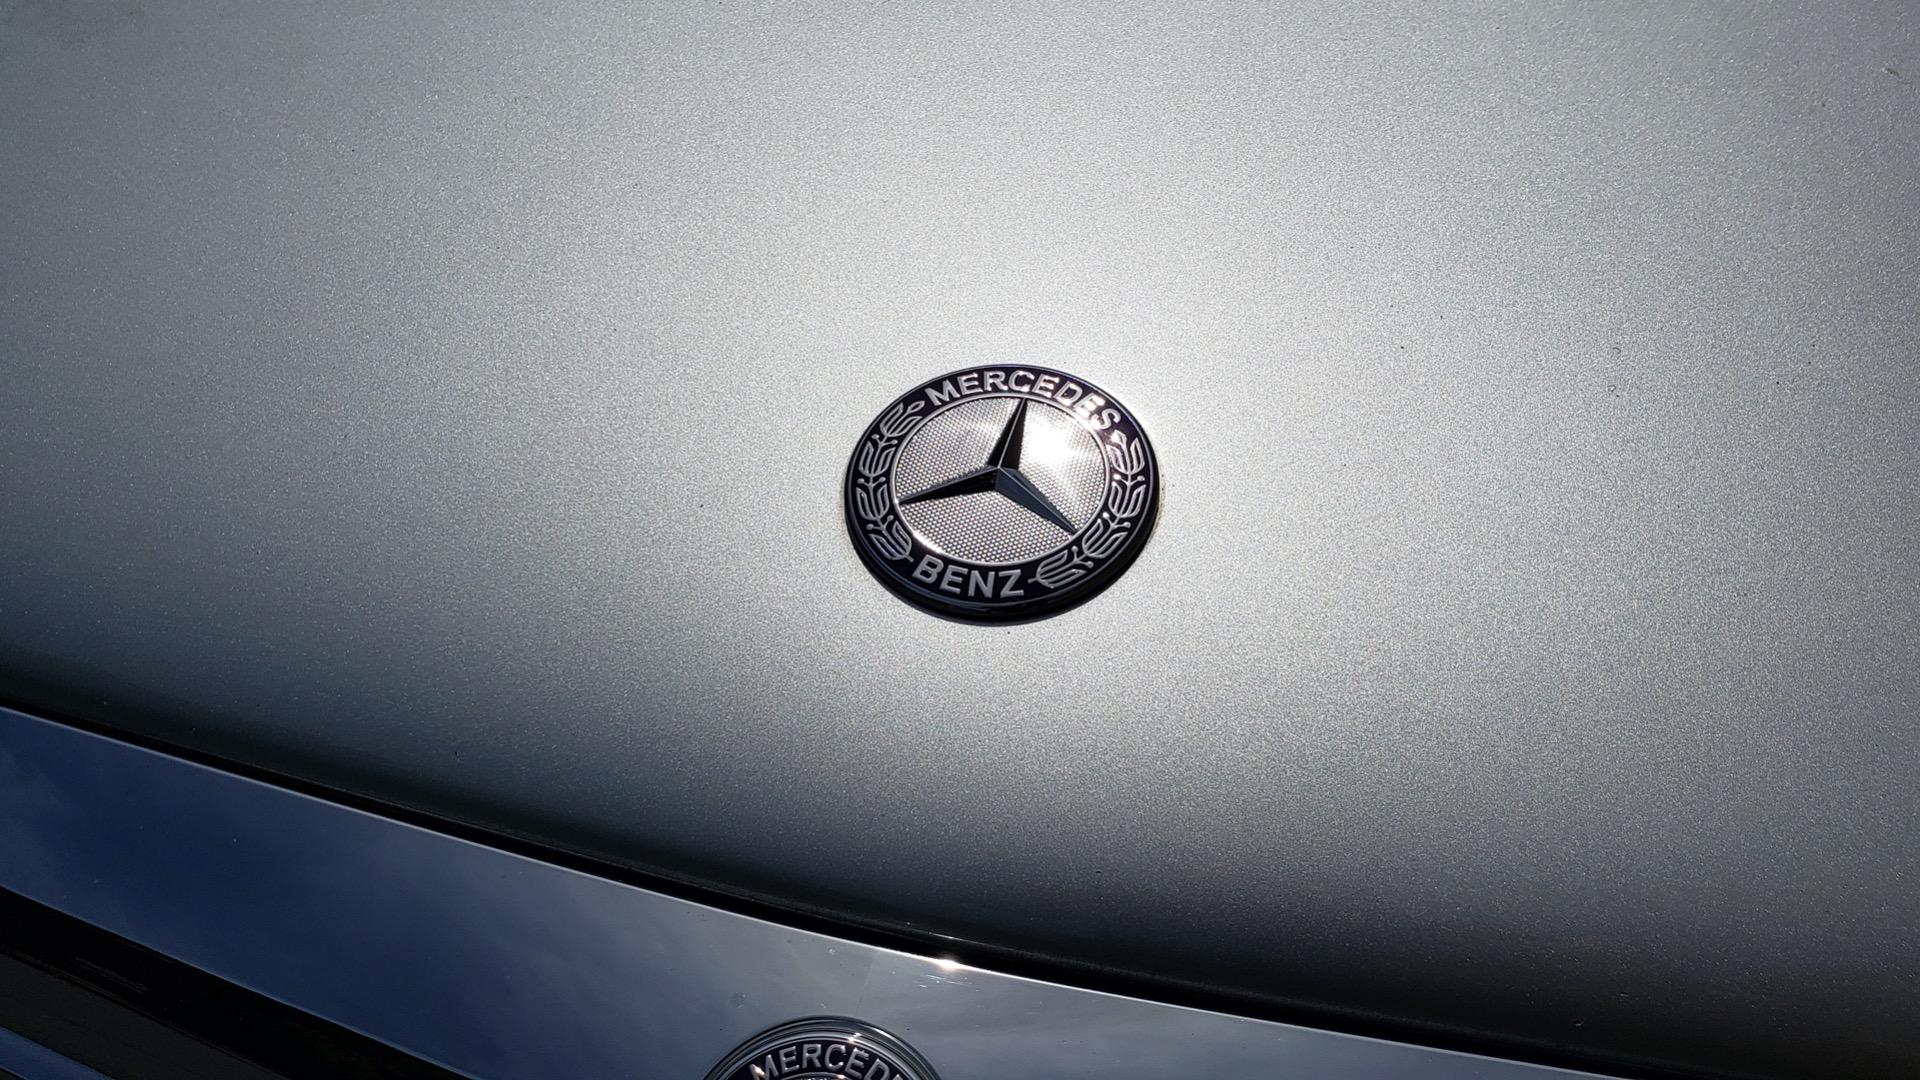 Used 2007 Mercedes-Benz E-Class E63 AMG WAGON / NAV / SUNROOF / HARMAN/KARDON for sale $29,000 at Formula Imports in Charlotte NC 28227 17